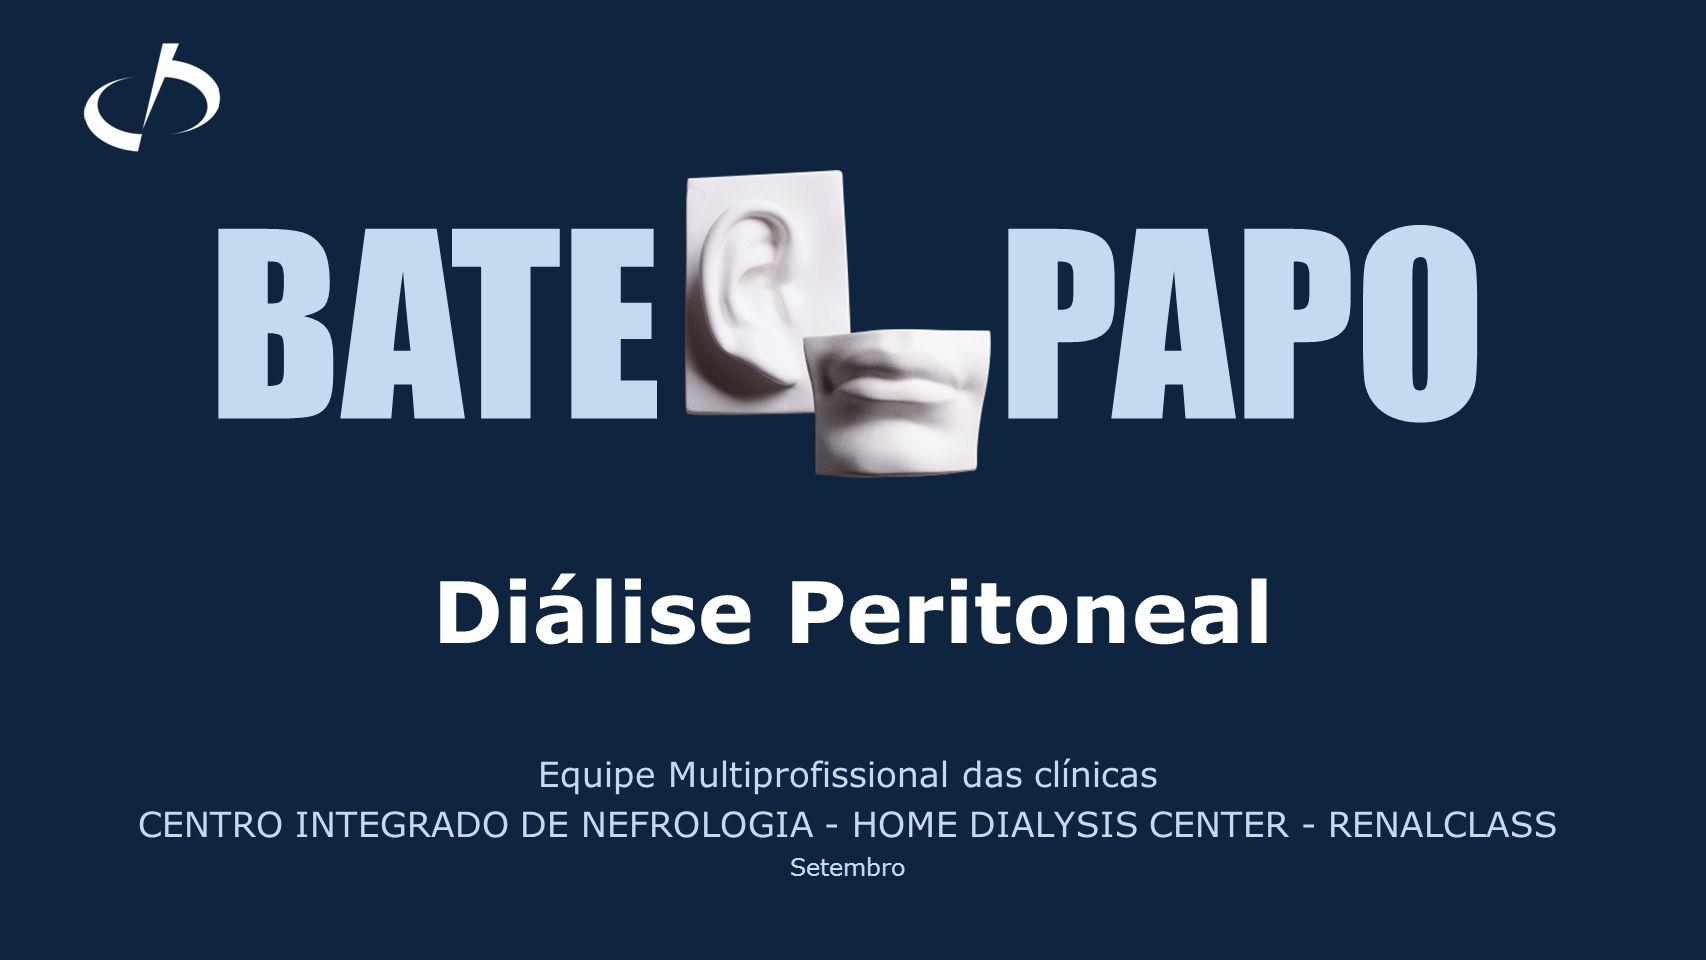 Equipe Multiprofissional das clínicas CENTRO INTEGRADO DE NEFROLOGIA - HOME DIALYSIS CENTER - RENALCLASS Setembro BATE PAPO Diálise Peritoneal